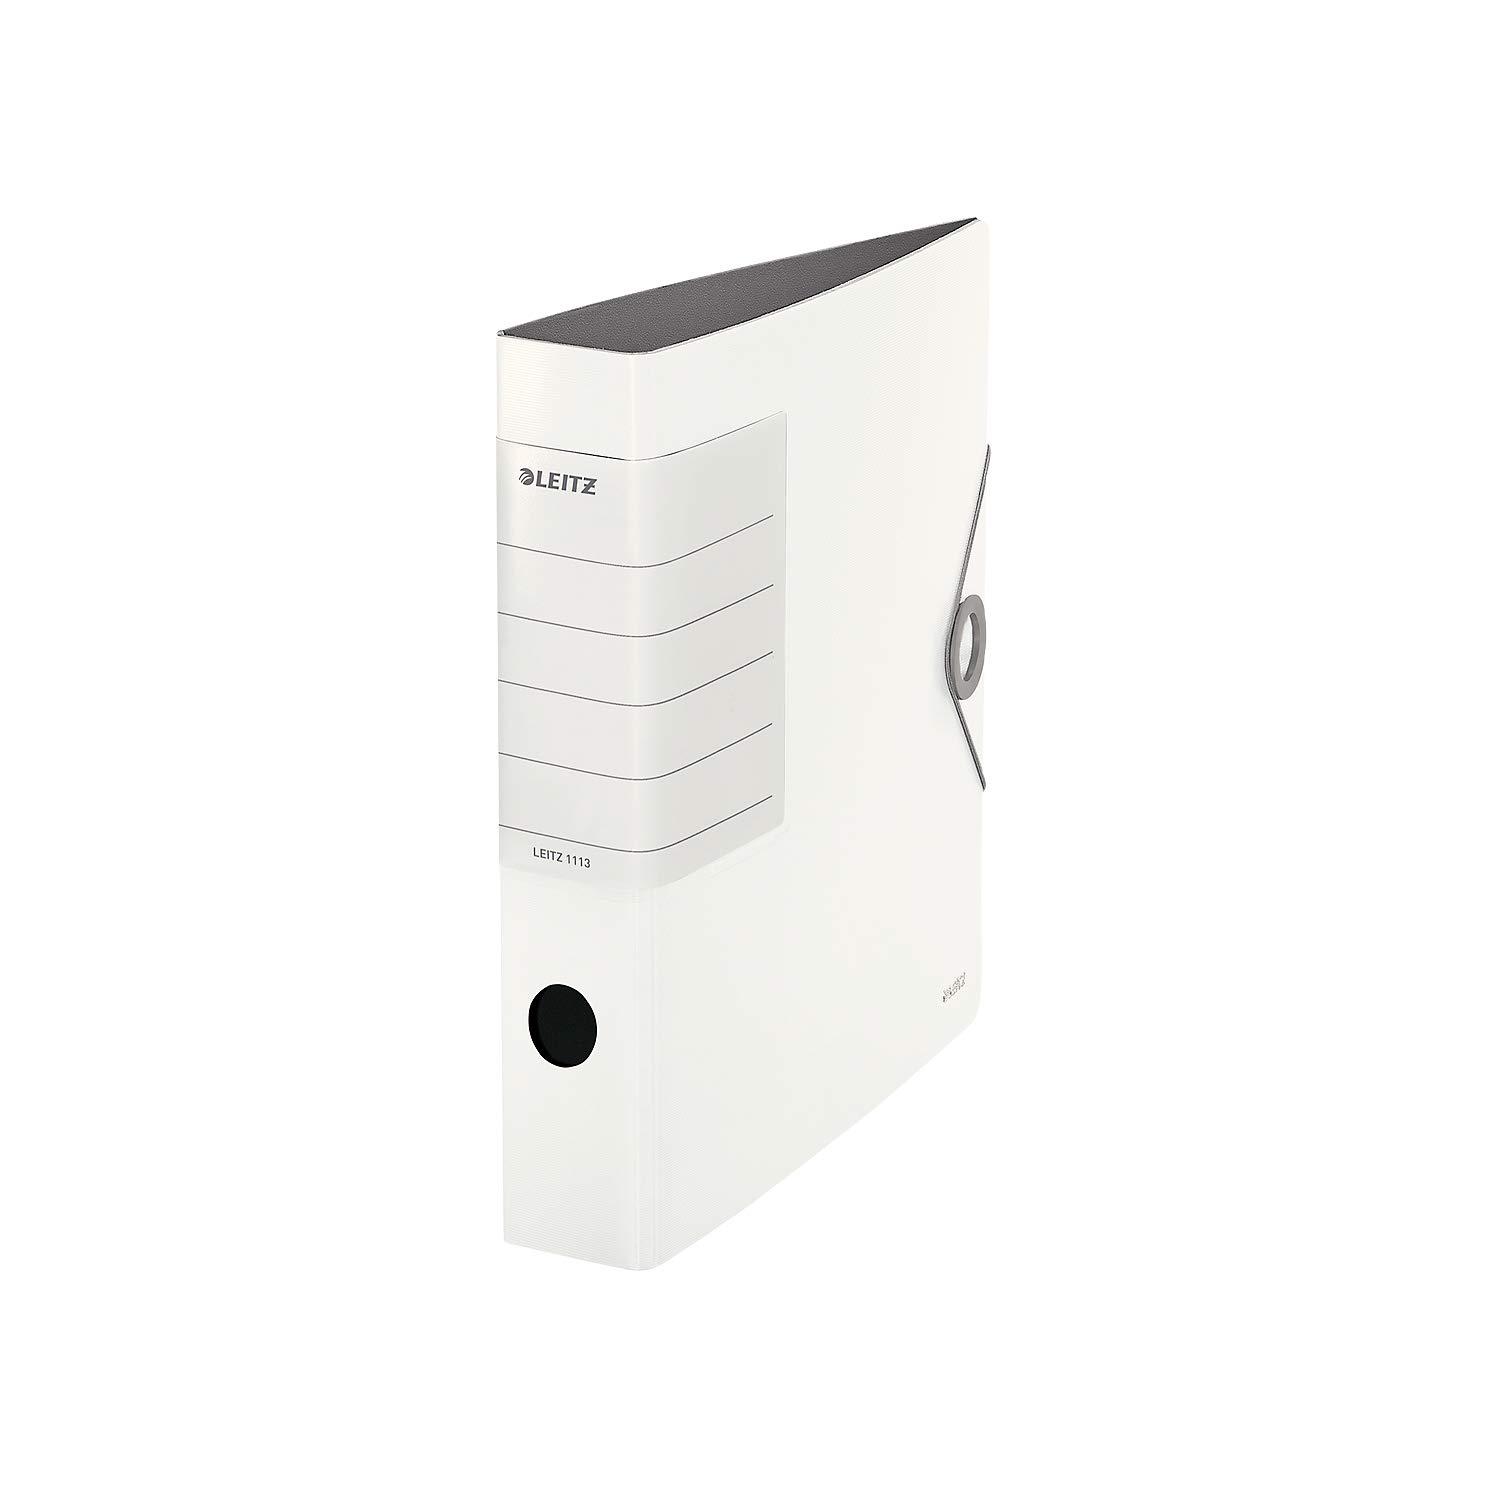 schwarz Leitz 11130095 Multifunktions-Ordner Solid A4, 2-fach-Lochung